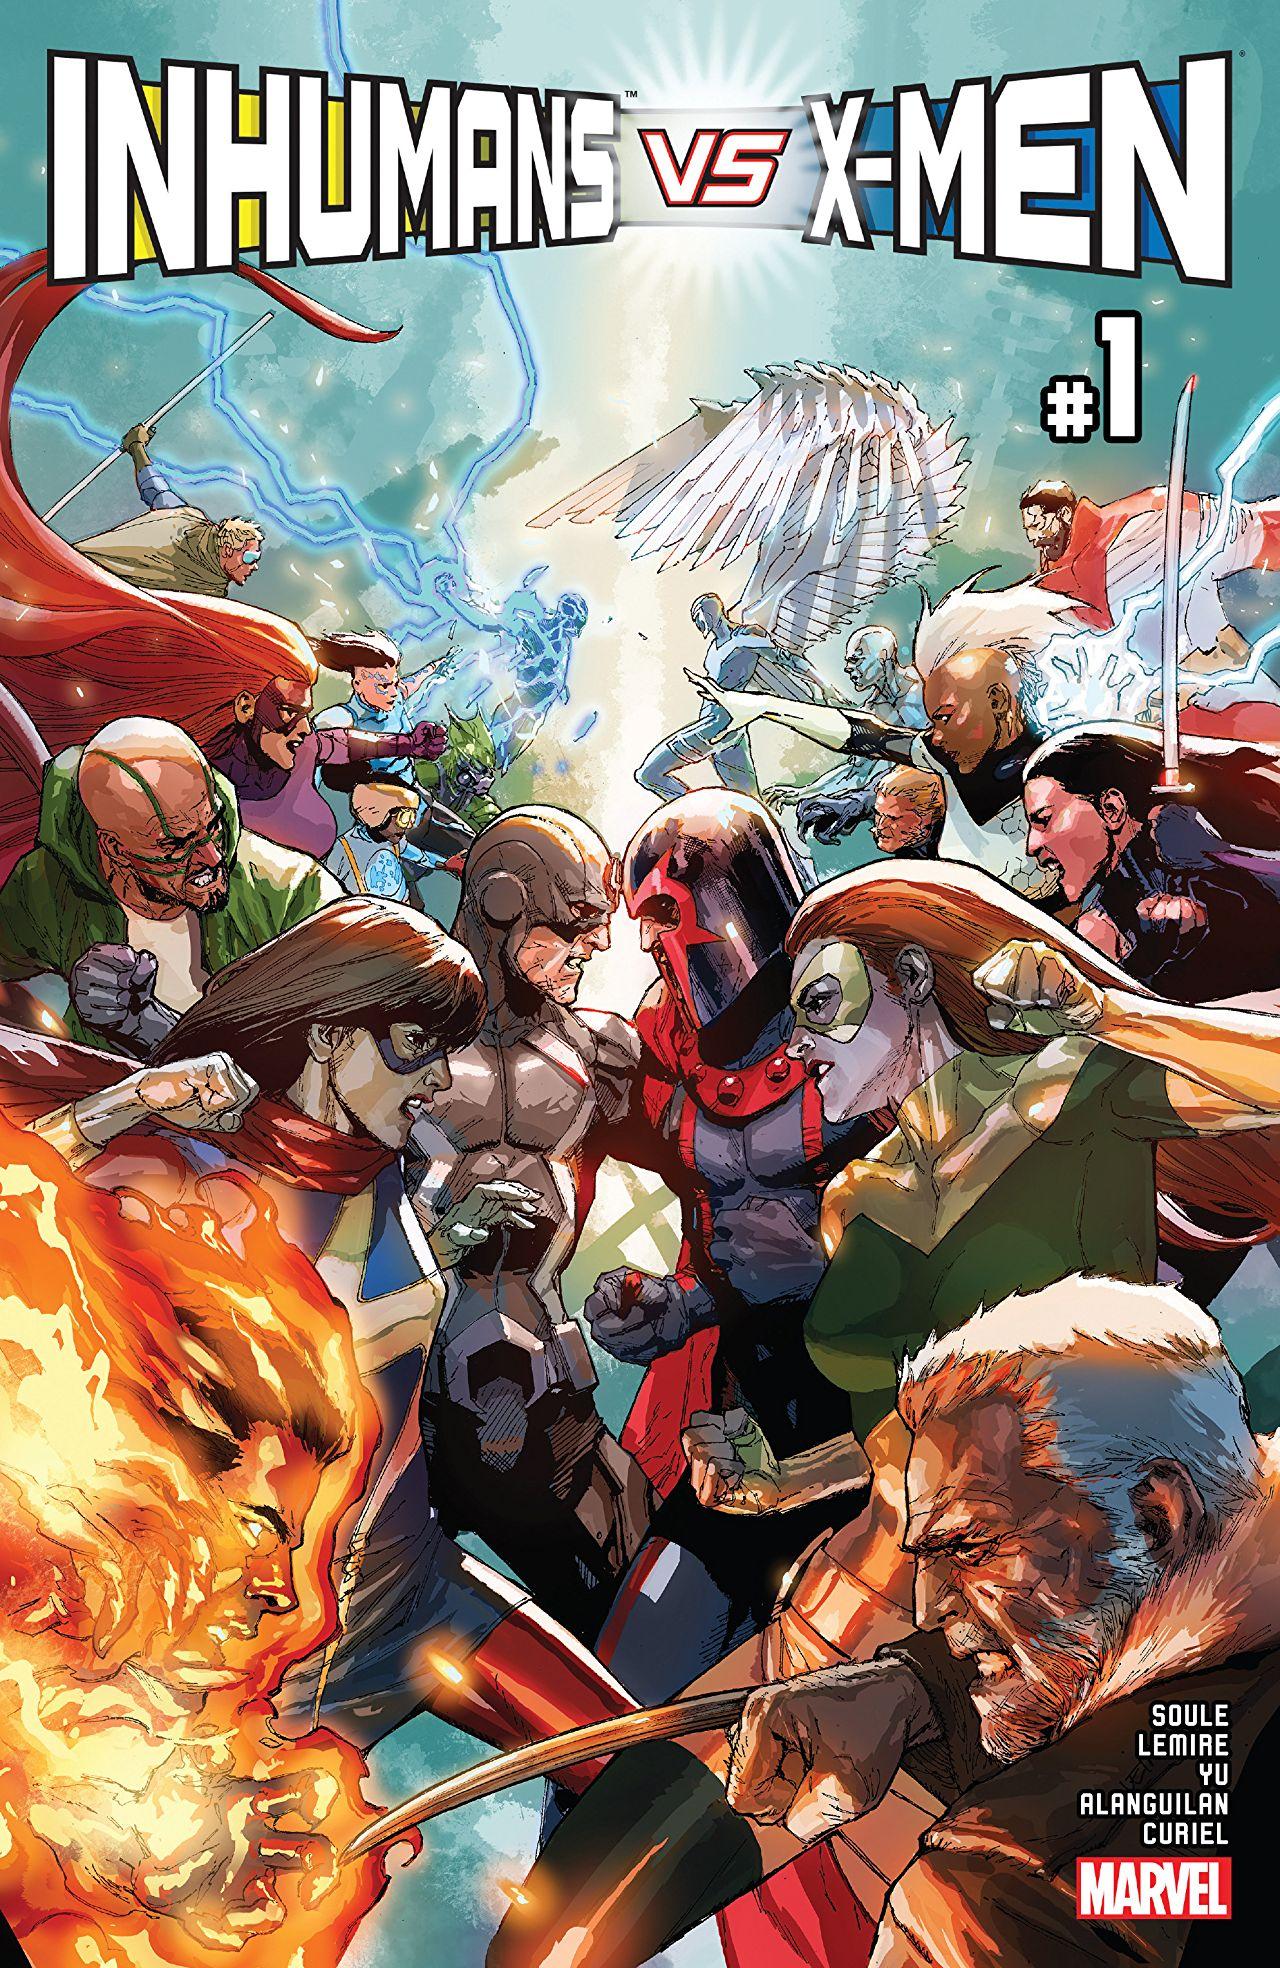 Inhumans vs. X-Men #1 Cover